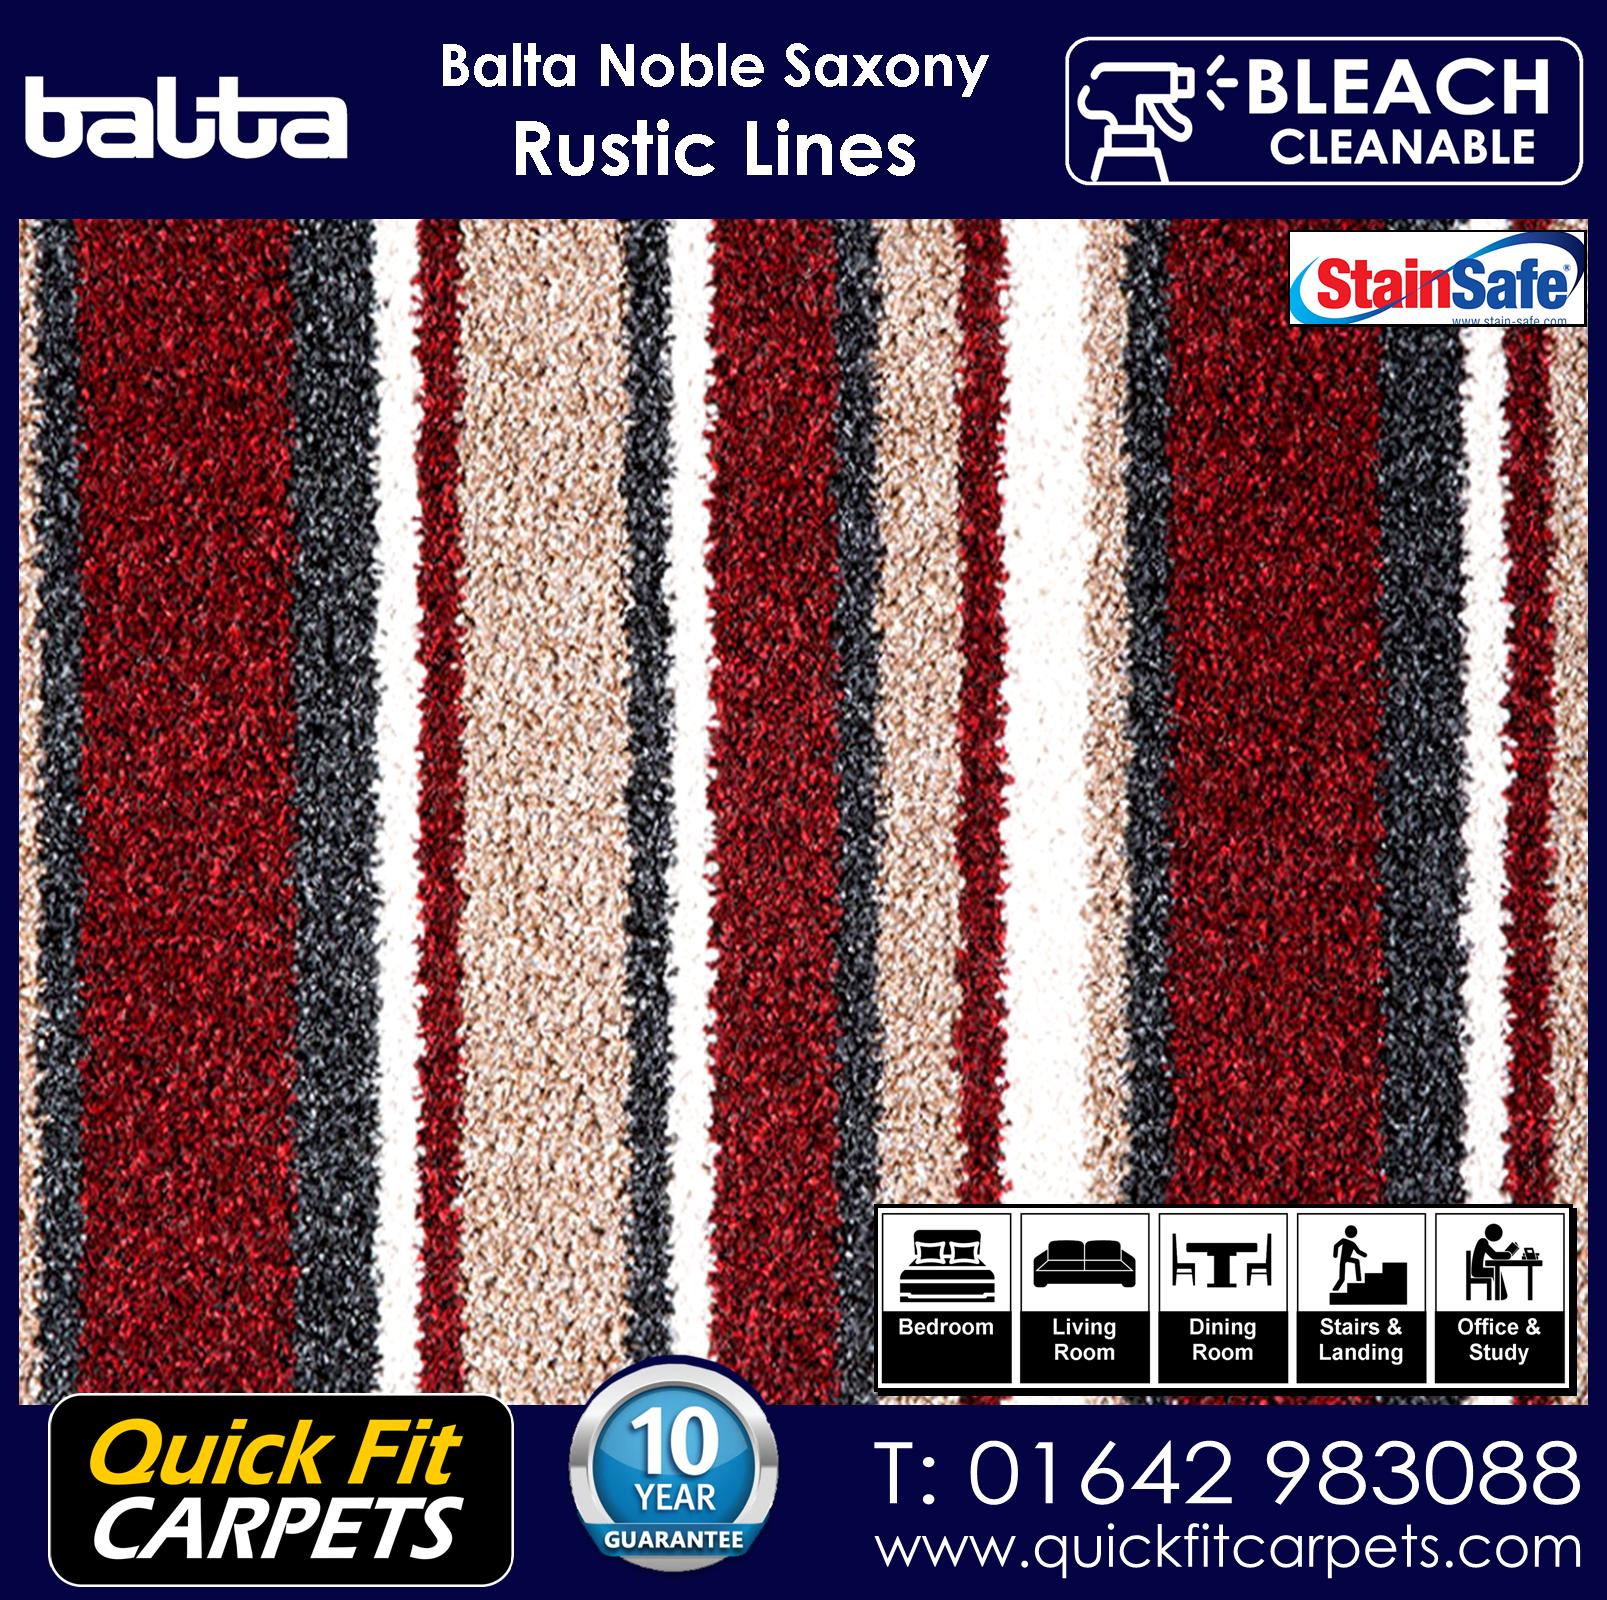 Quick Fit Carpets Balta Luxury Pile Rustic Lines